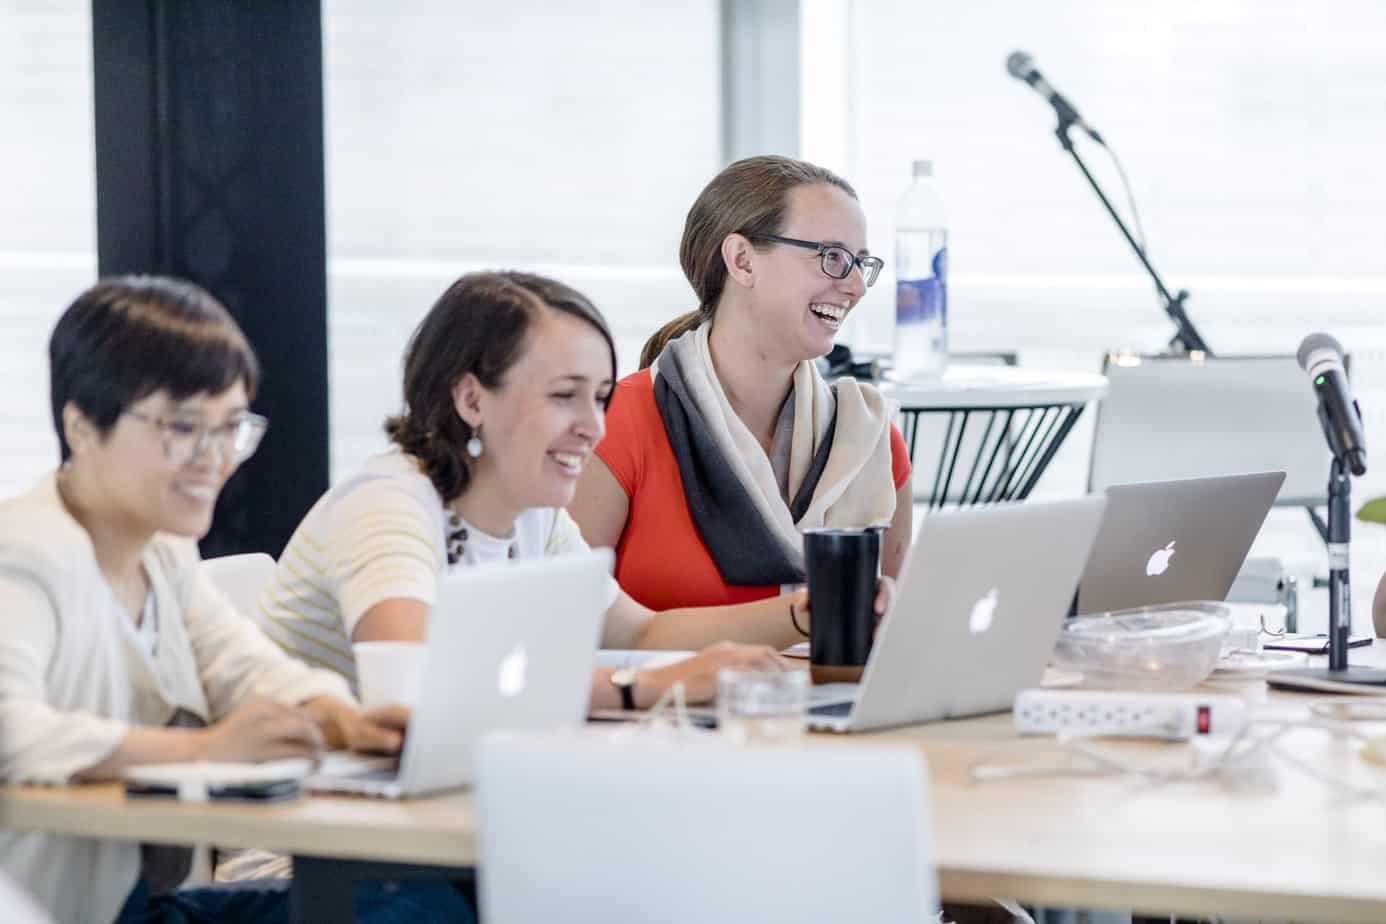 Discourse staff - Independent News Challenge